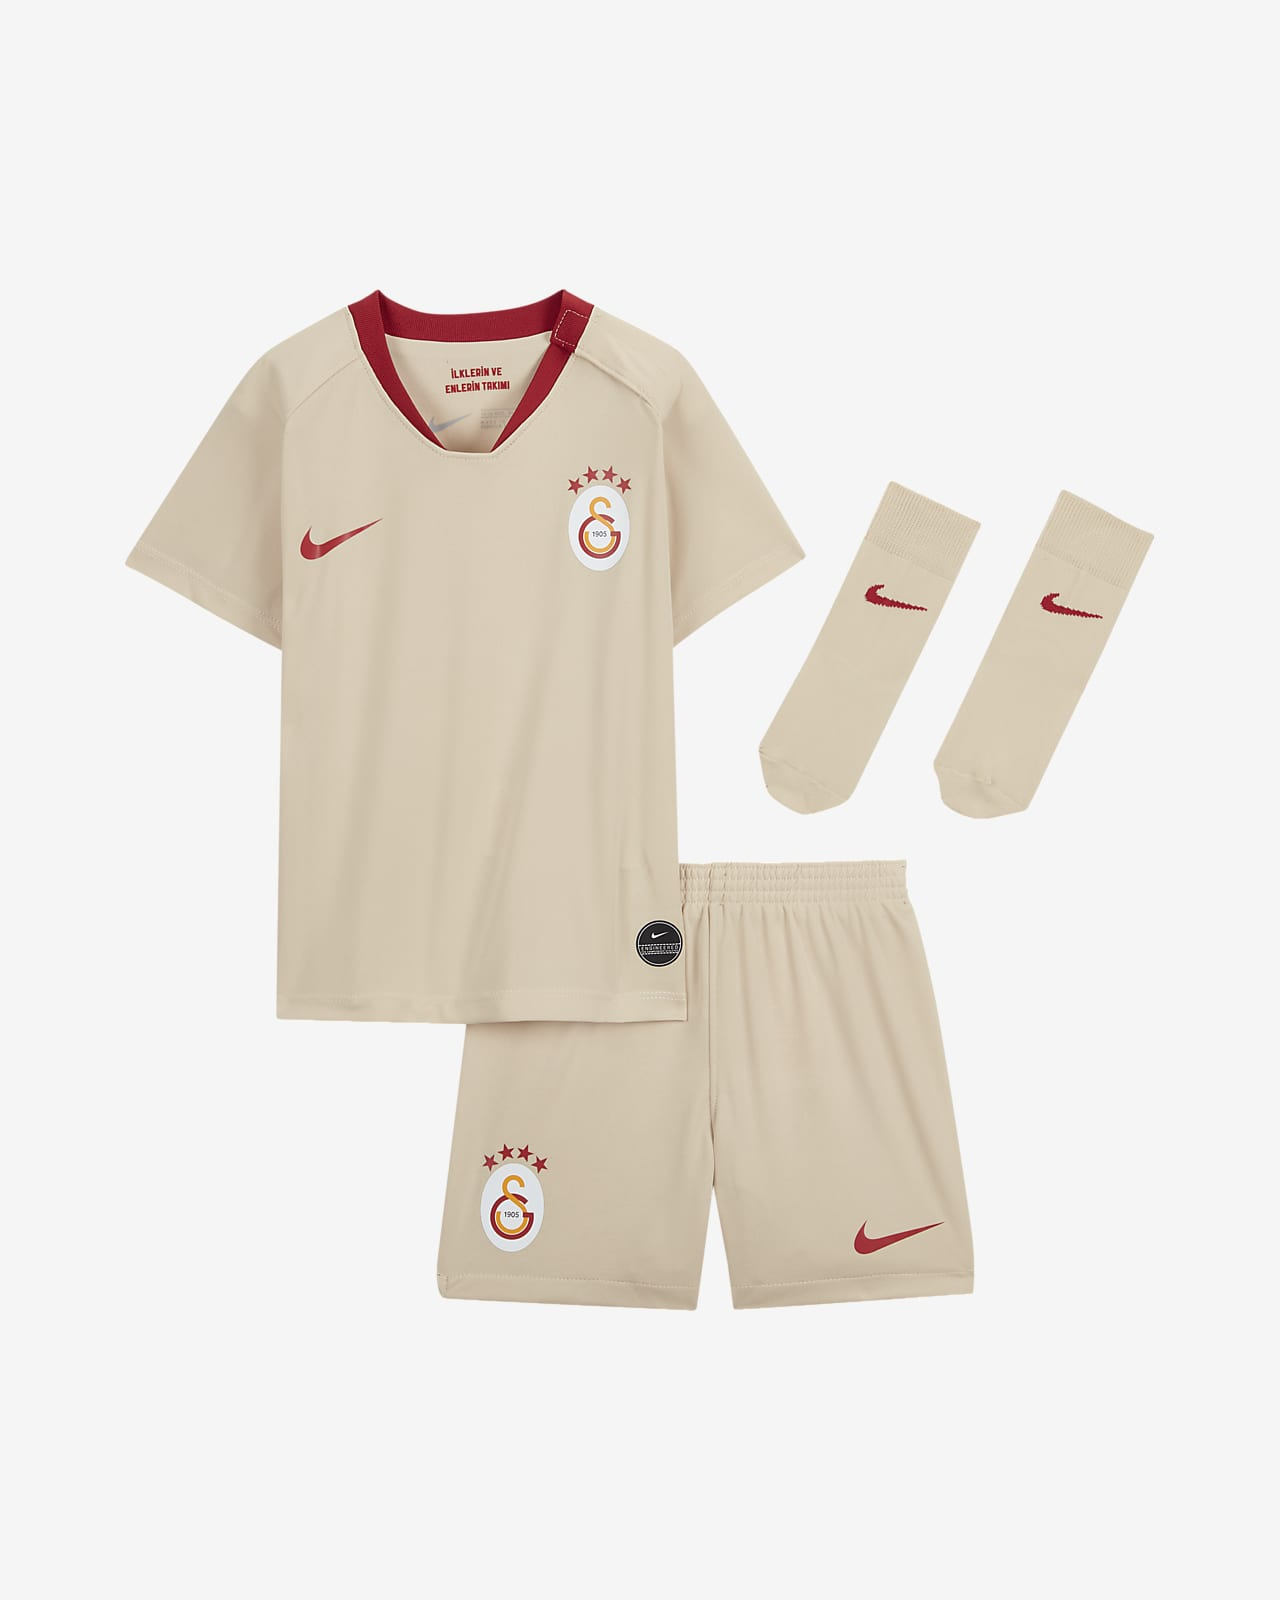 Kit de visitante para bebés e infantil del Galatasaray 2019/20